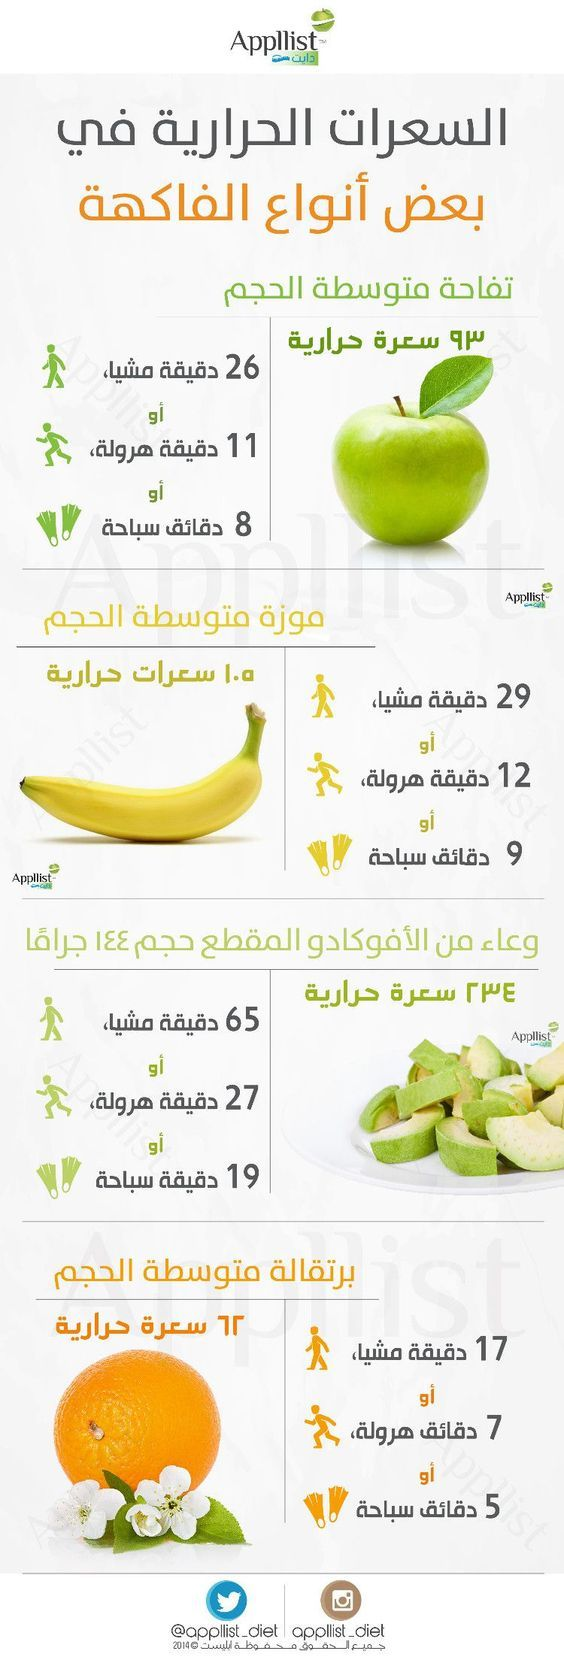 معلومات طبية و صحية Anycanal Health Fitness Nutrition Health Food Healthy Lifestyle Habits